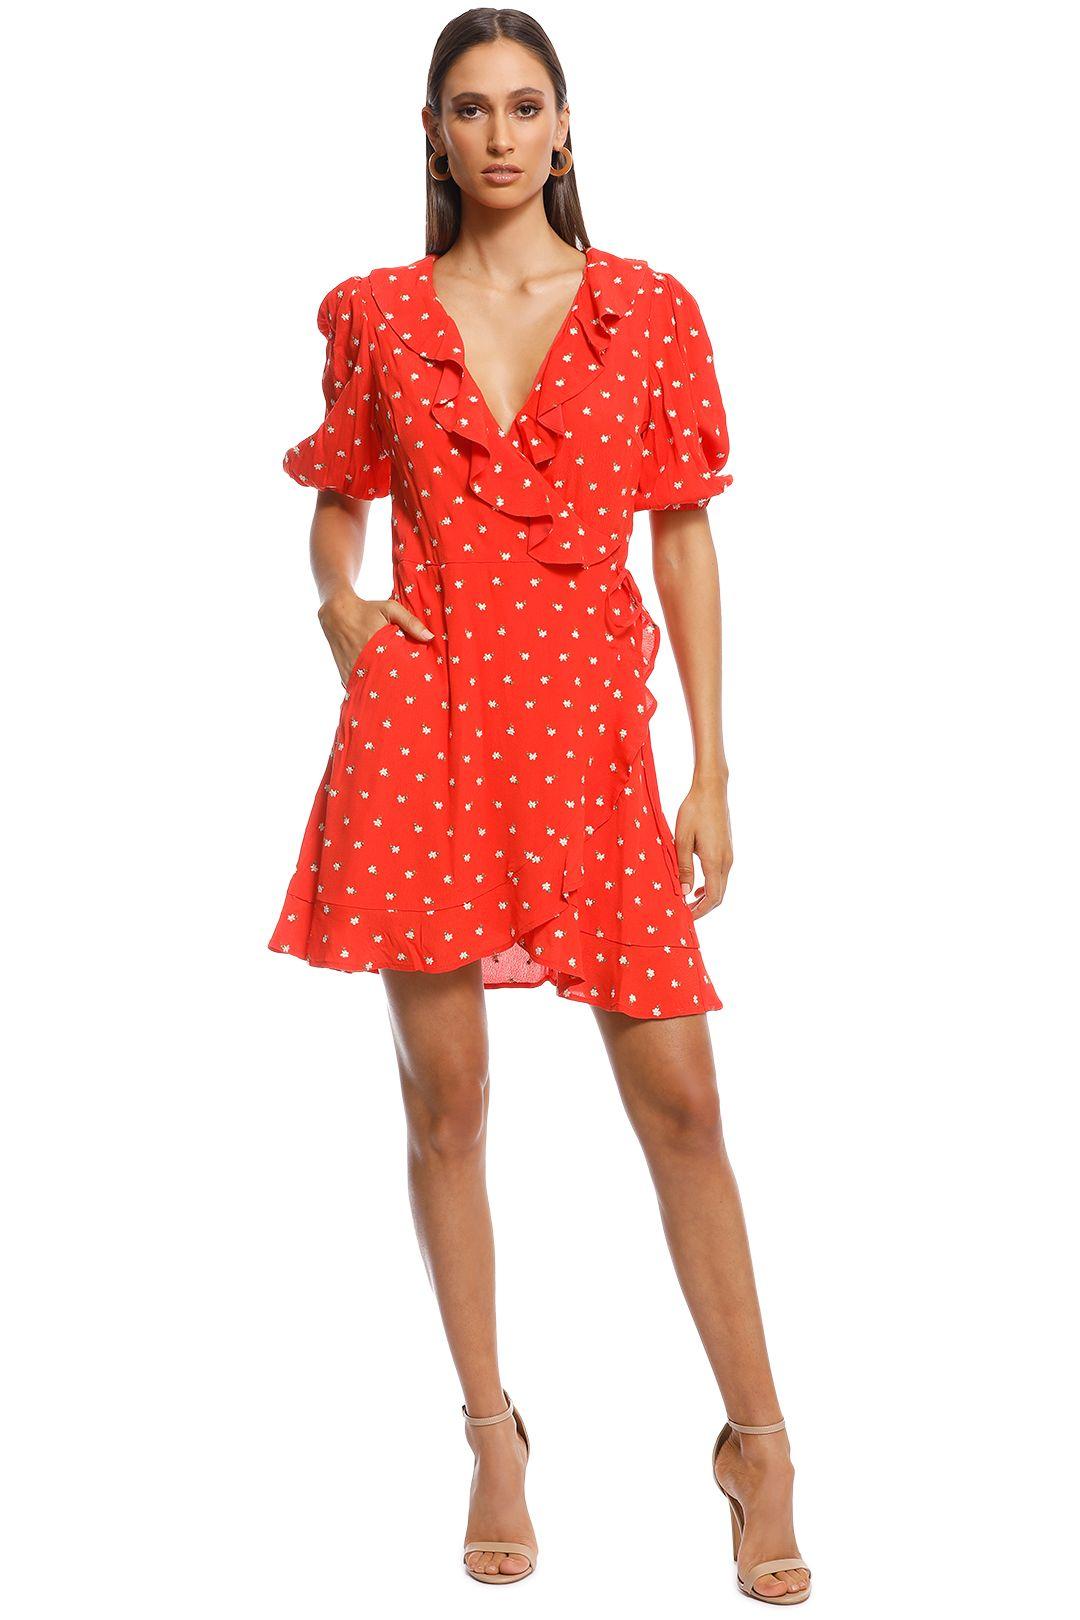 Perseverance London - Margarita Embroidered Crepe Ruffled Wrap Mini Dress - Orange - Front